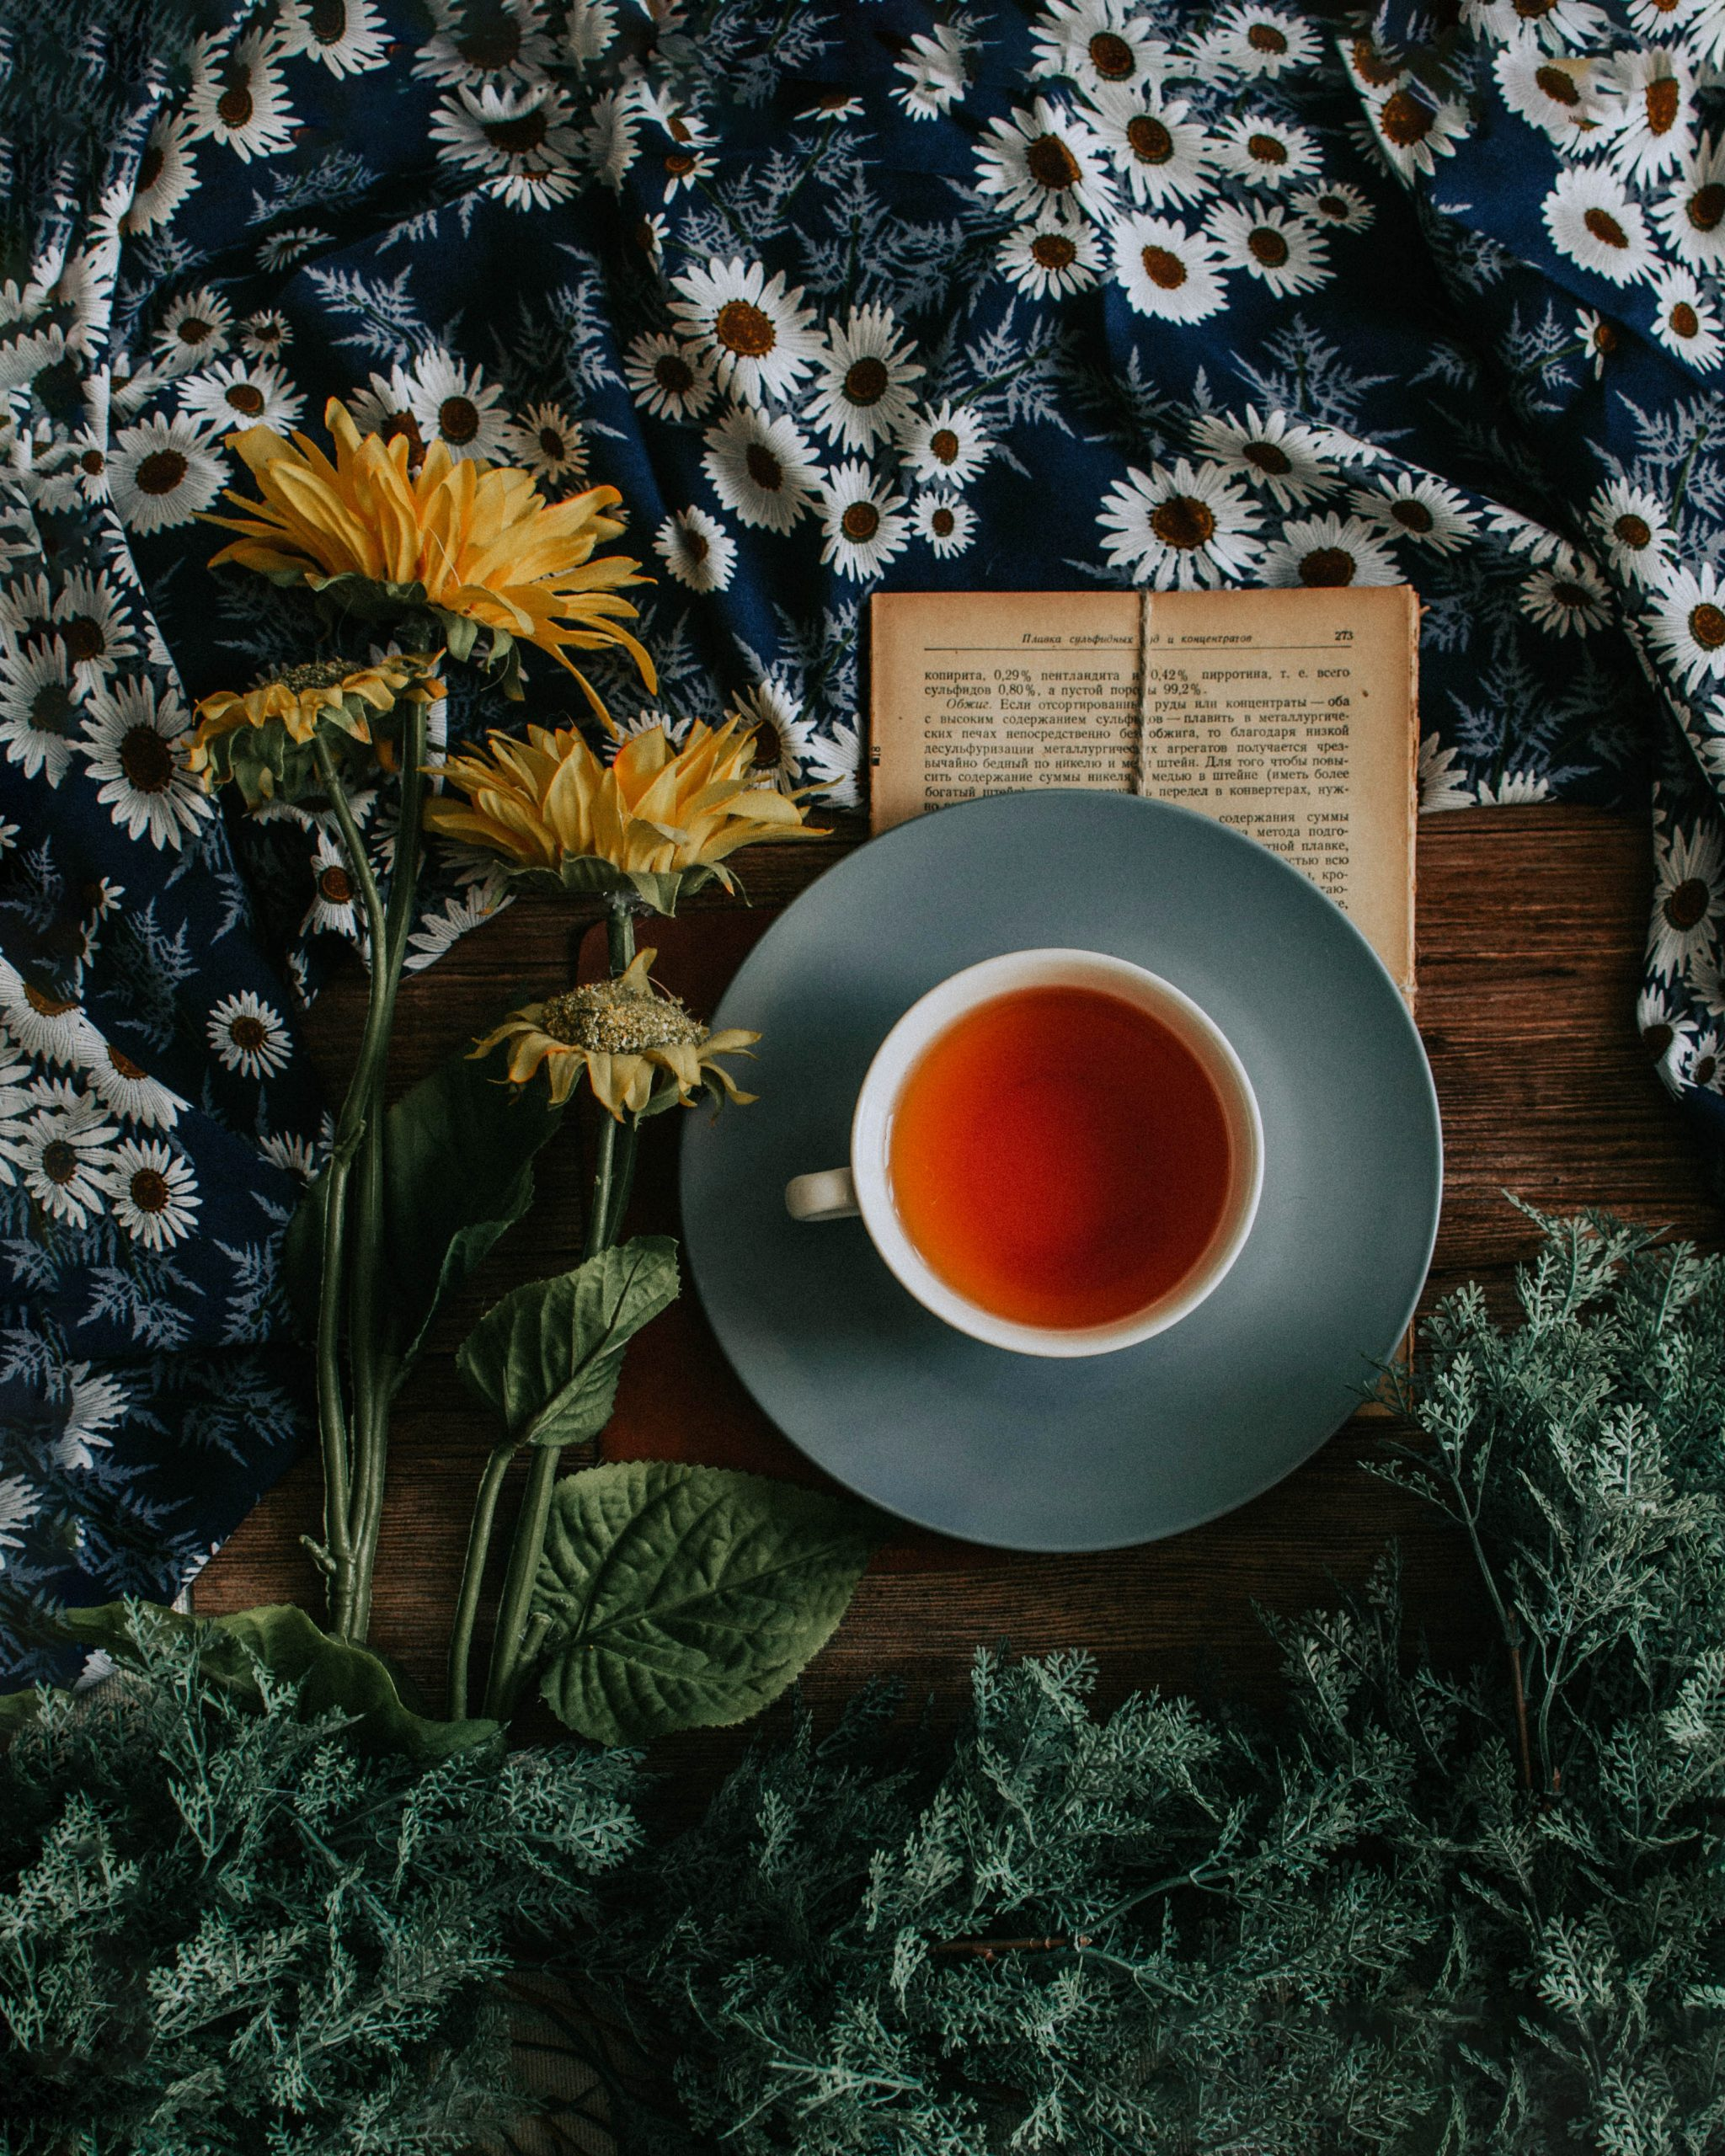 What tea do you serve at a tea party?